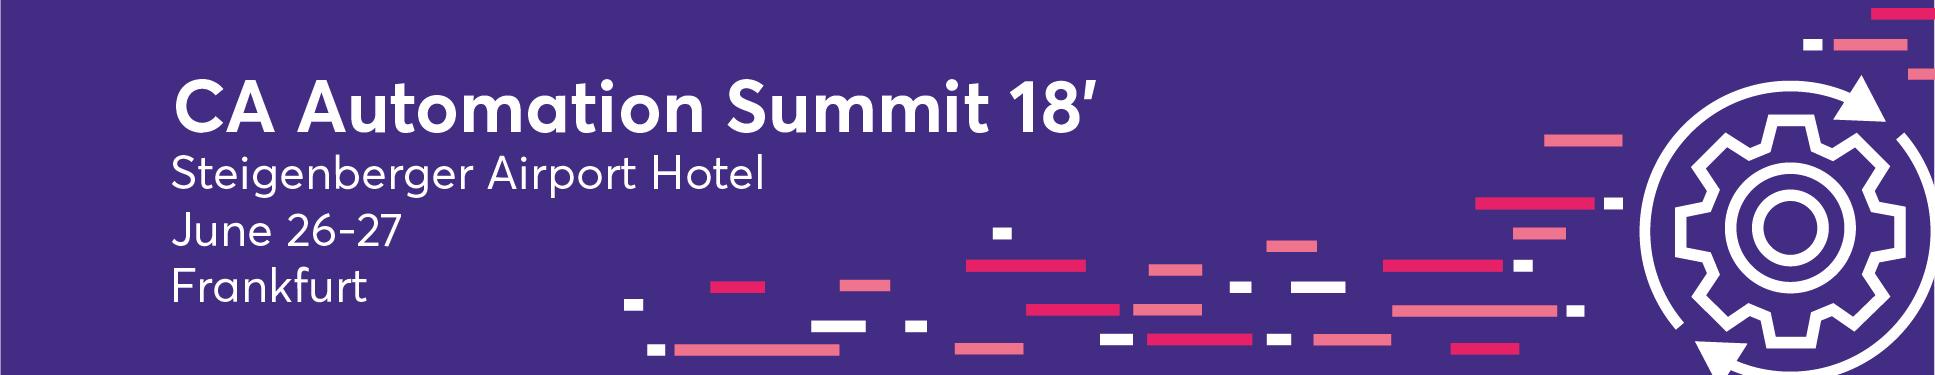 CA Automation Summit 2018